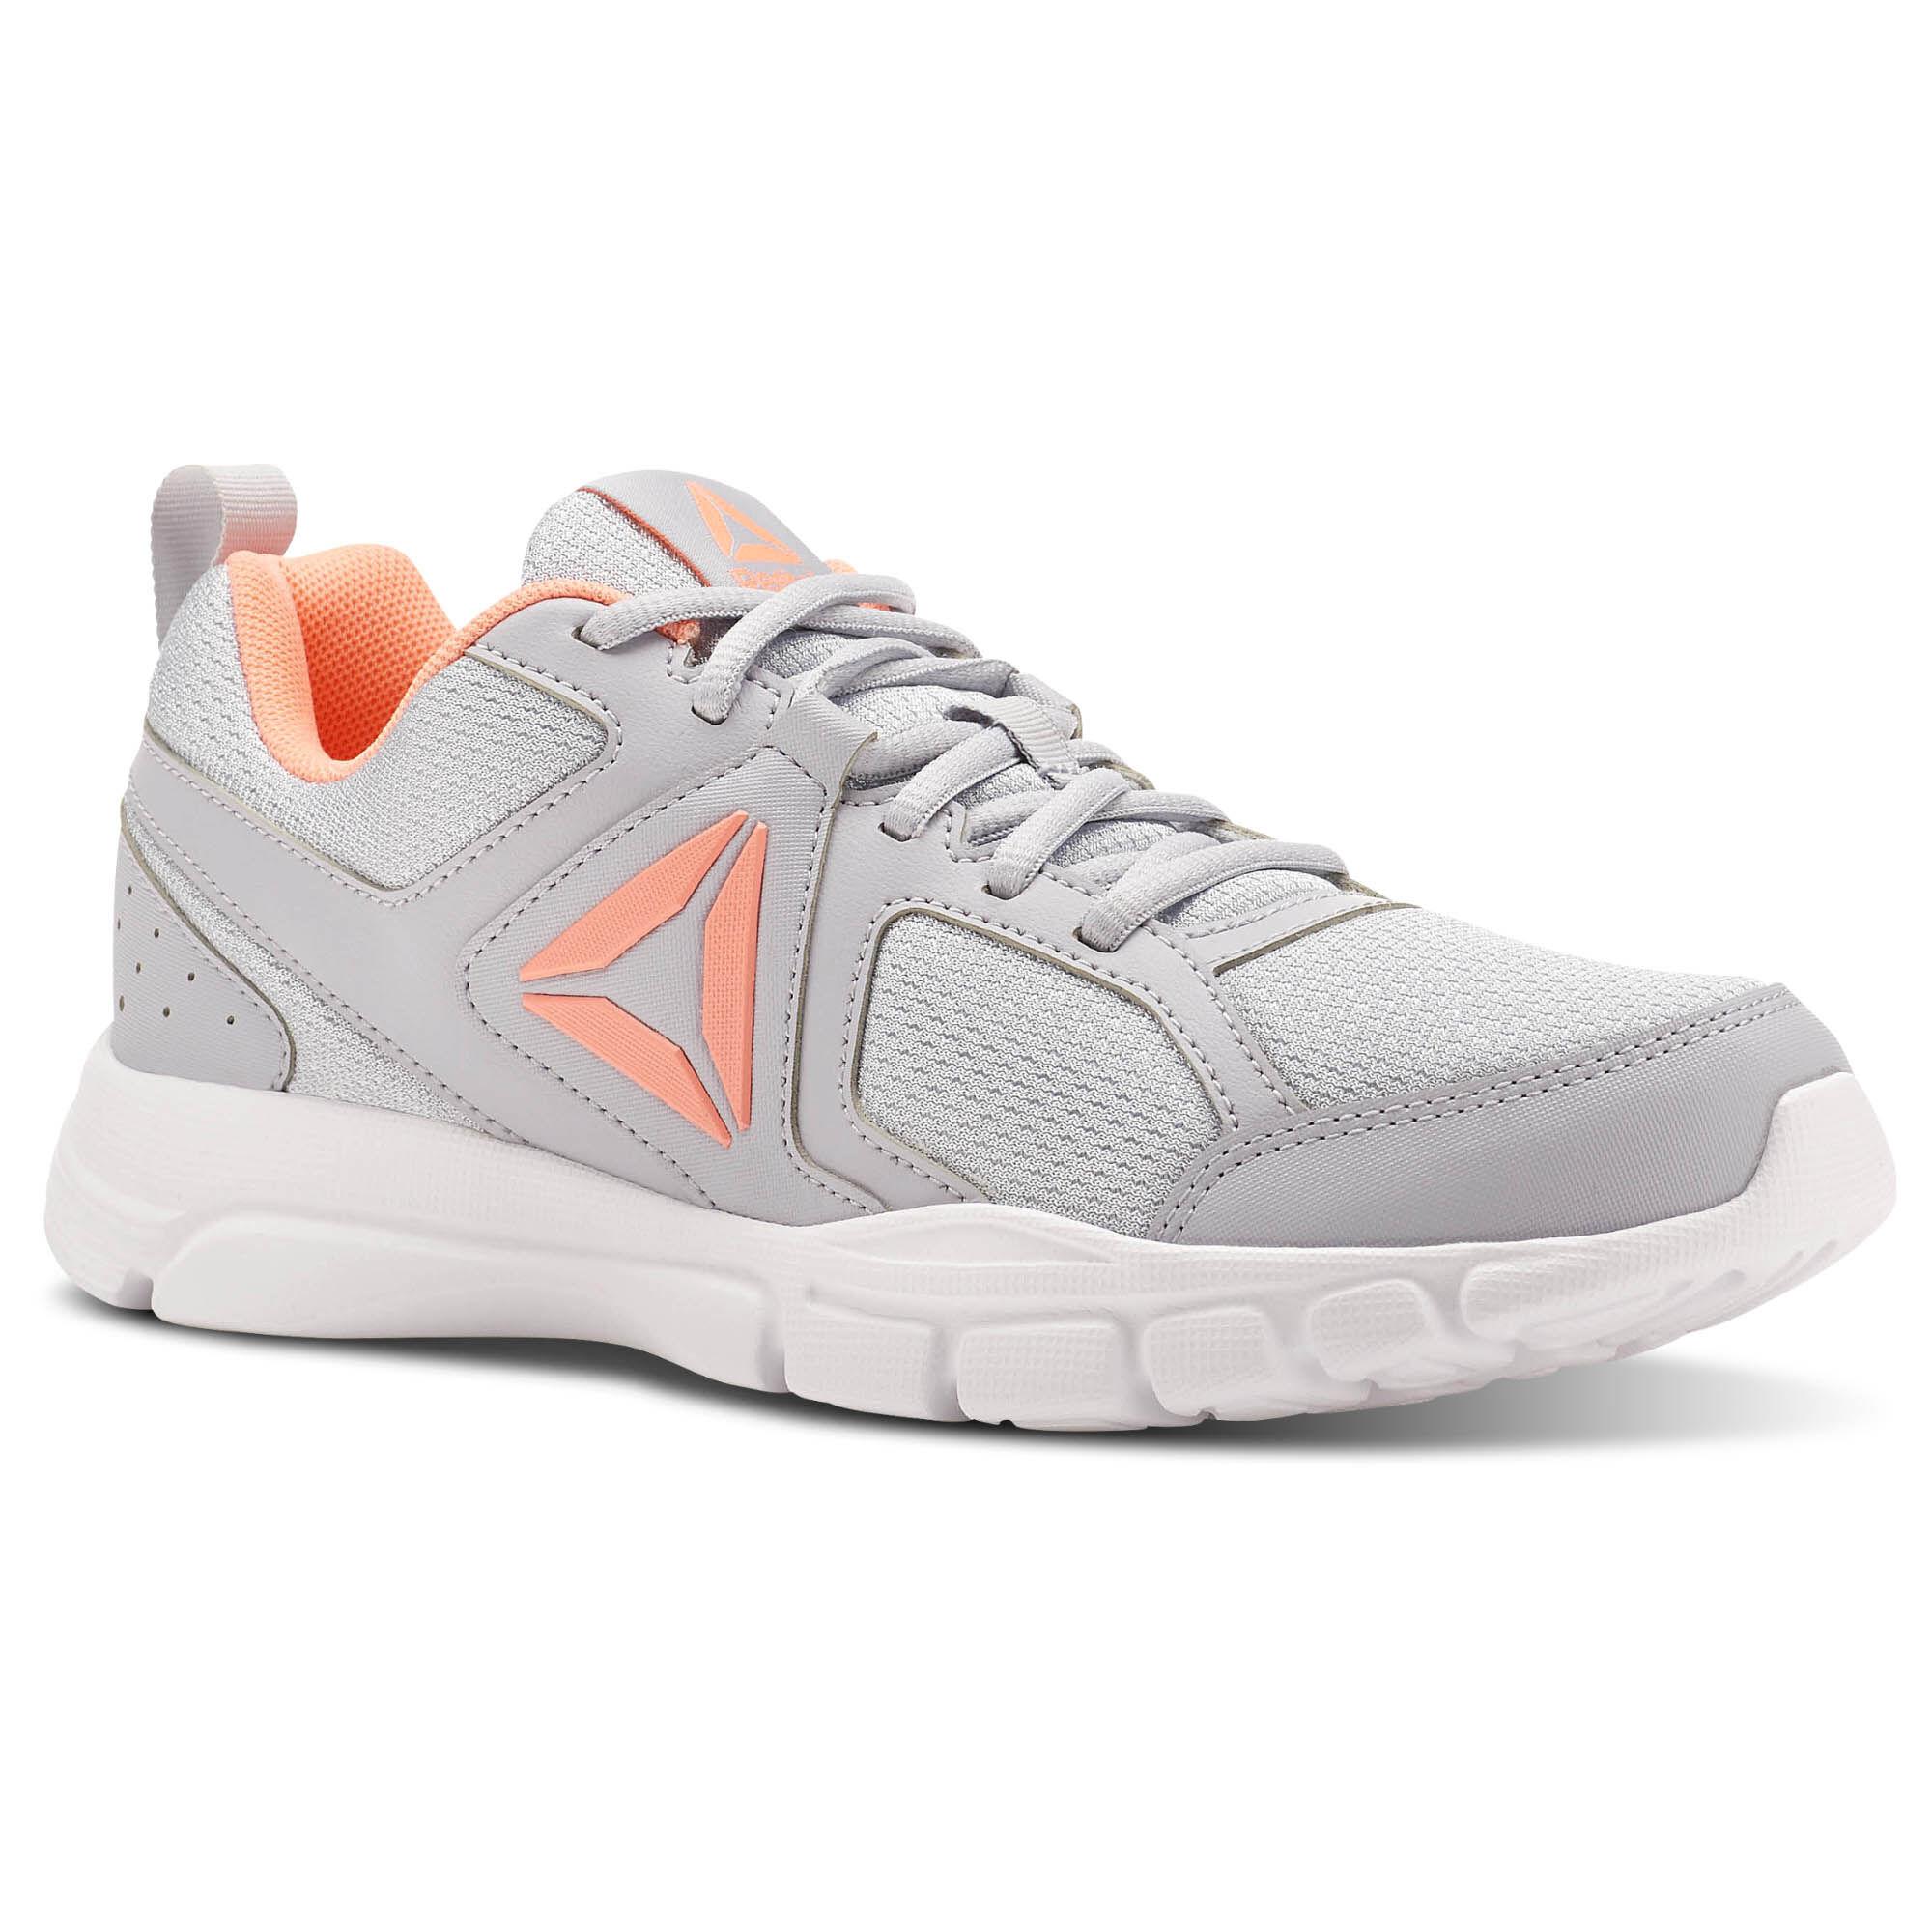 Schuhe Reebok - Ahary Runner CN5345 White/Navy/Pink wDaN4M